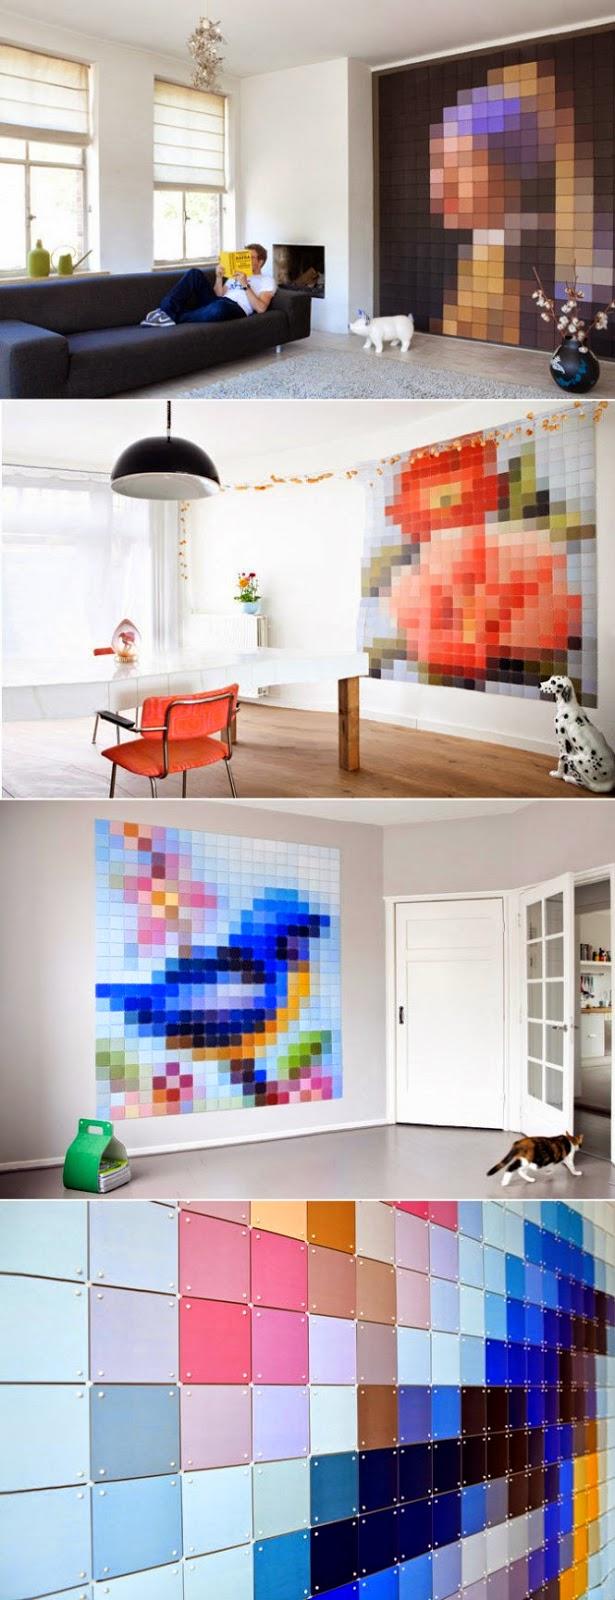 Living In A Digital World For Living Room Design